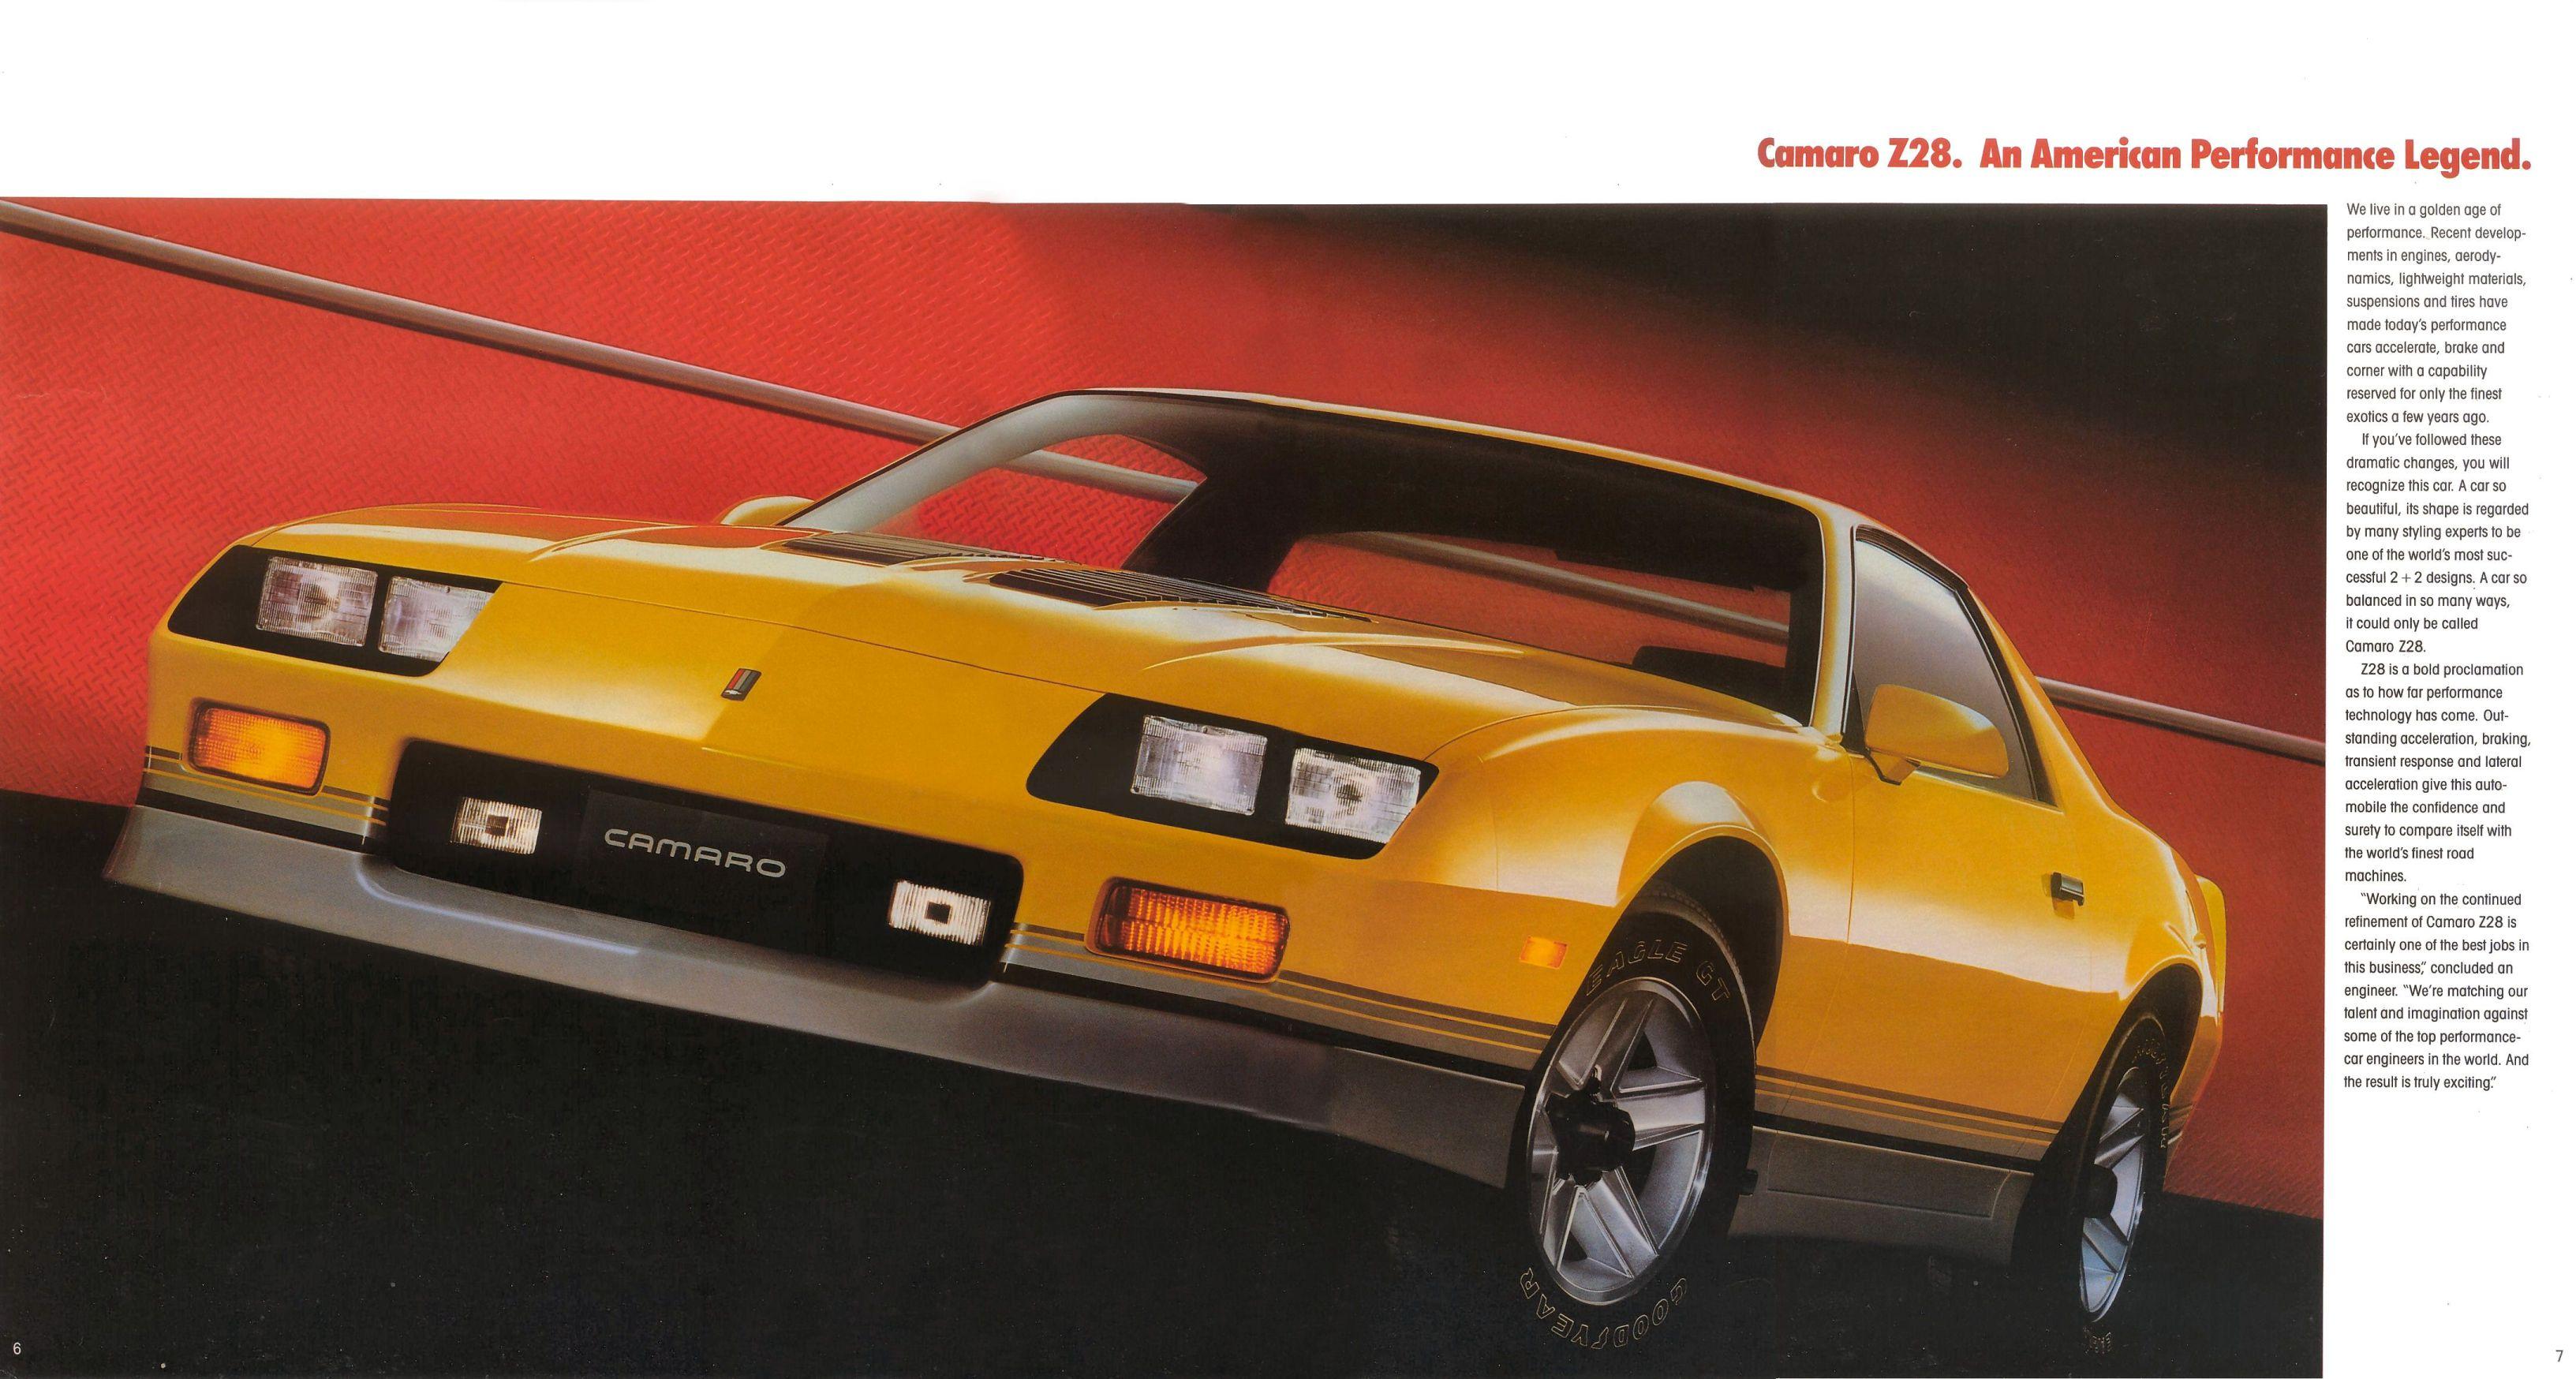 Image: 1986 Chevrolet Camaro/1986 Chevrolet Camaro-06-07